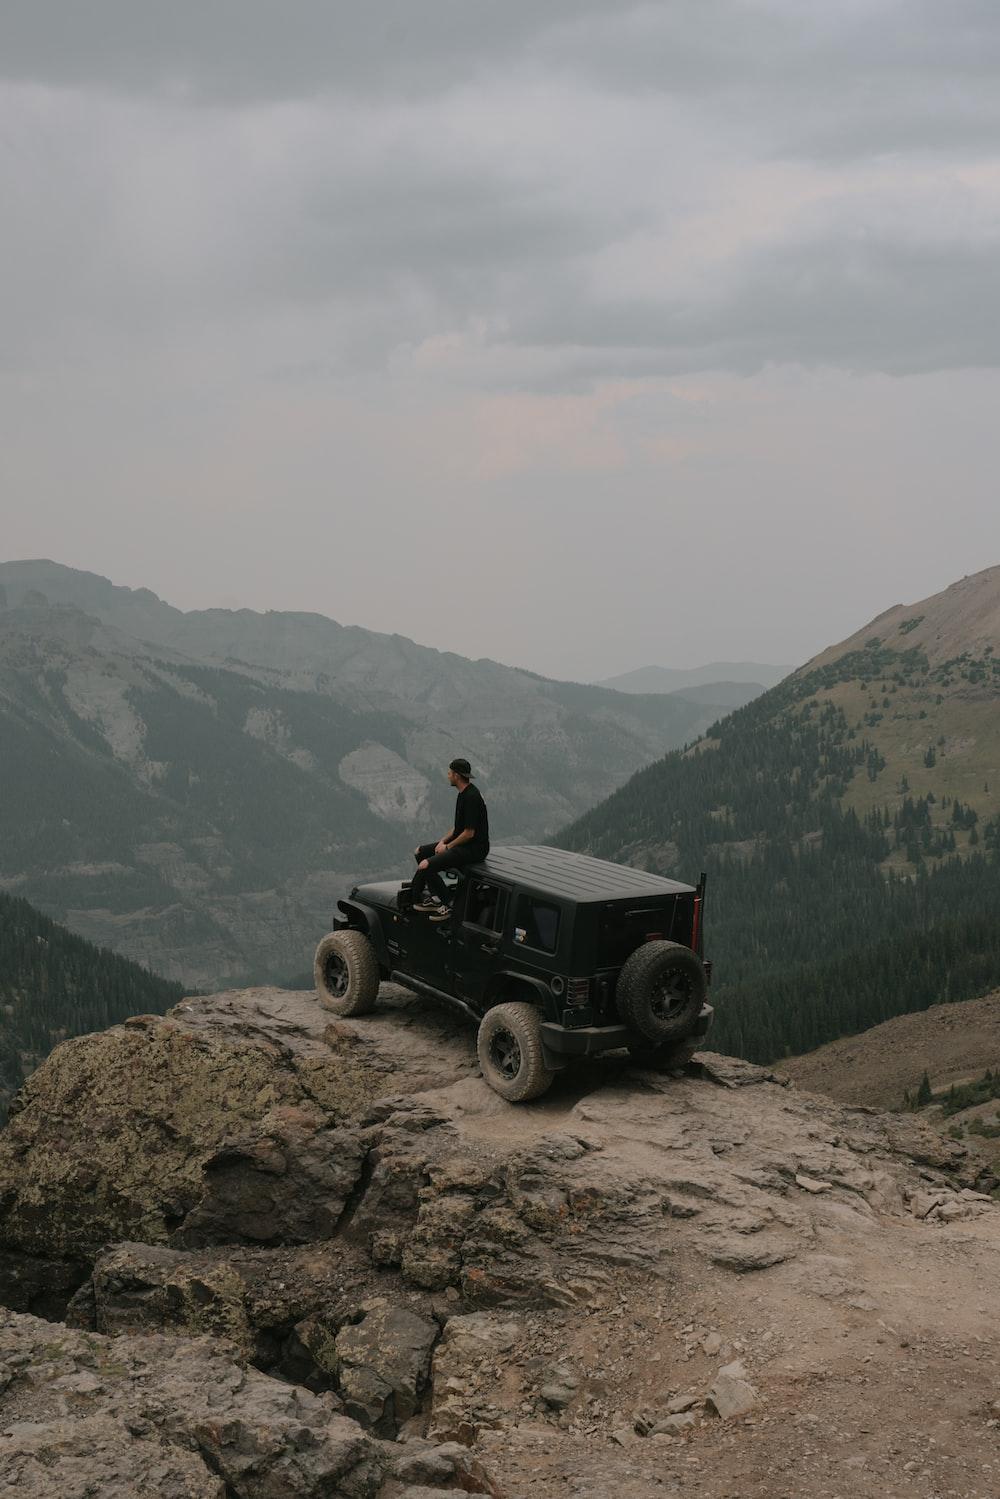 man in black shirt sitting on black jeep wrangler on rocky mountain during daytime